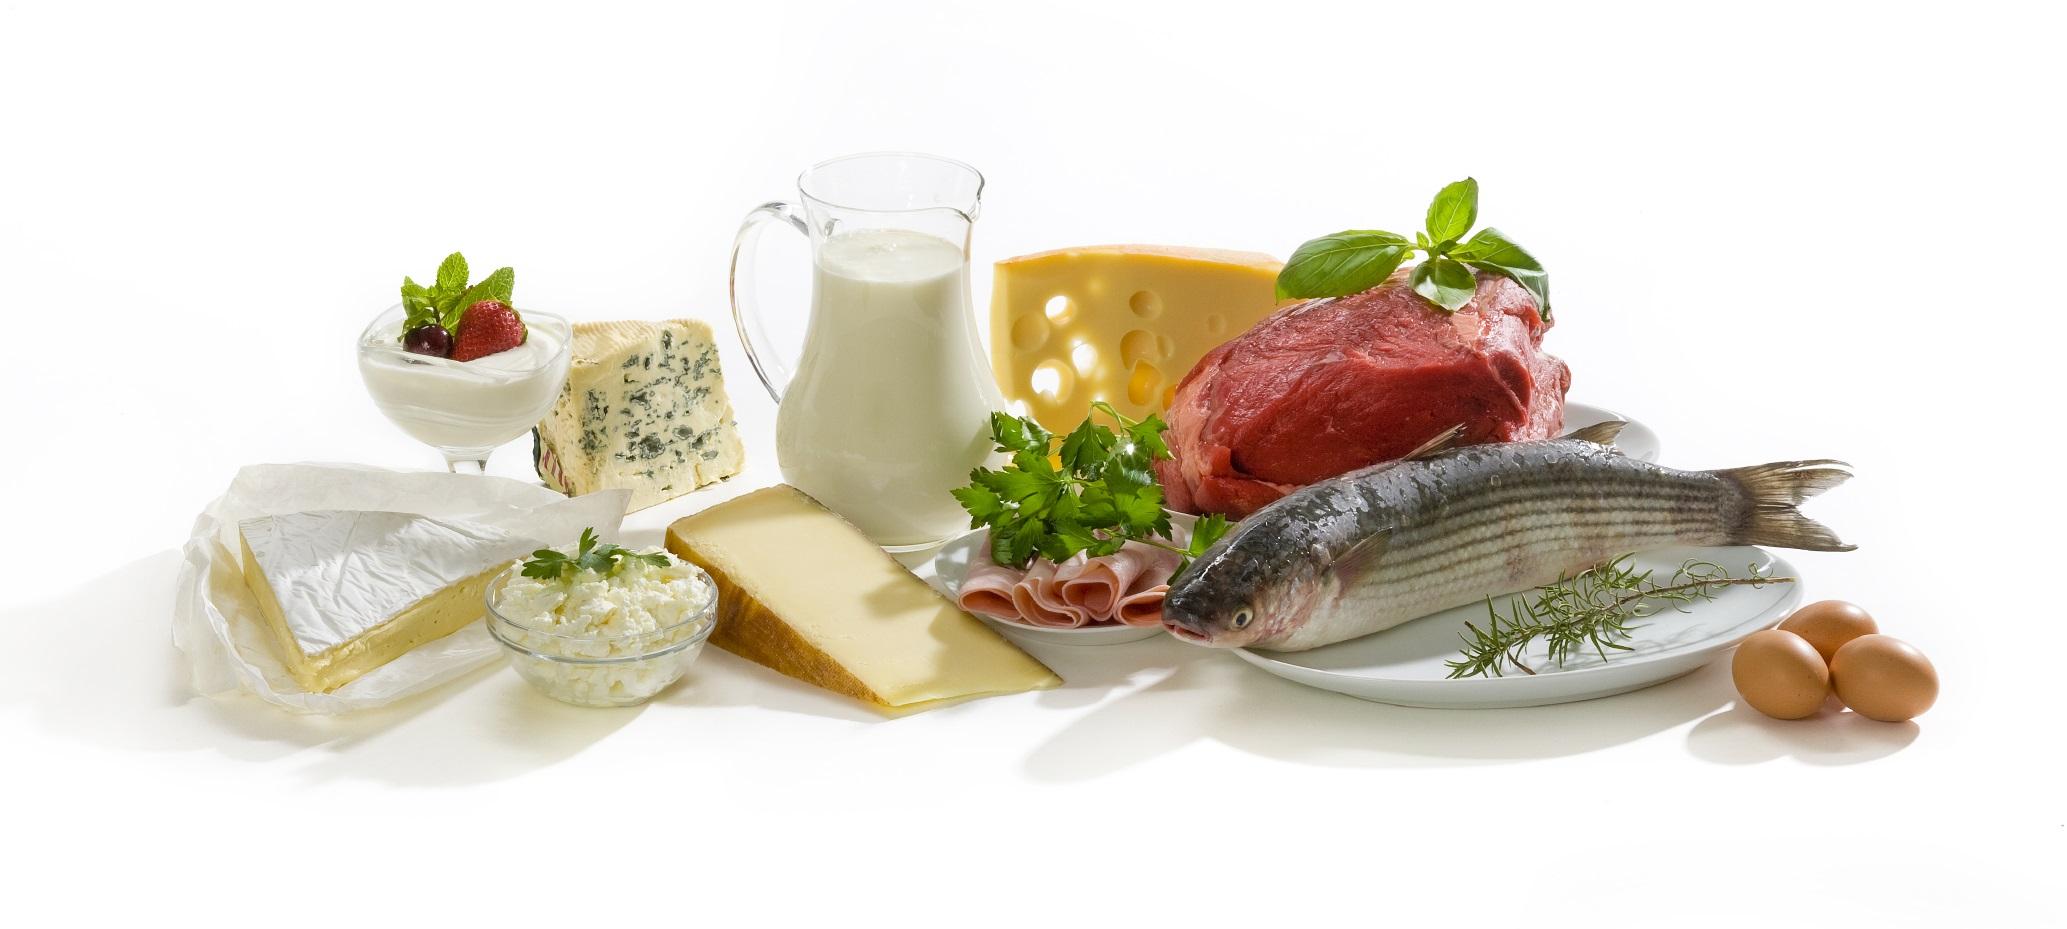 Pedoman Diet untuk Penderita Batu Ginjal